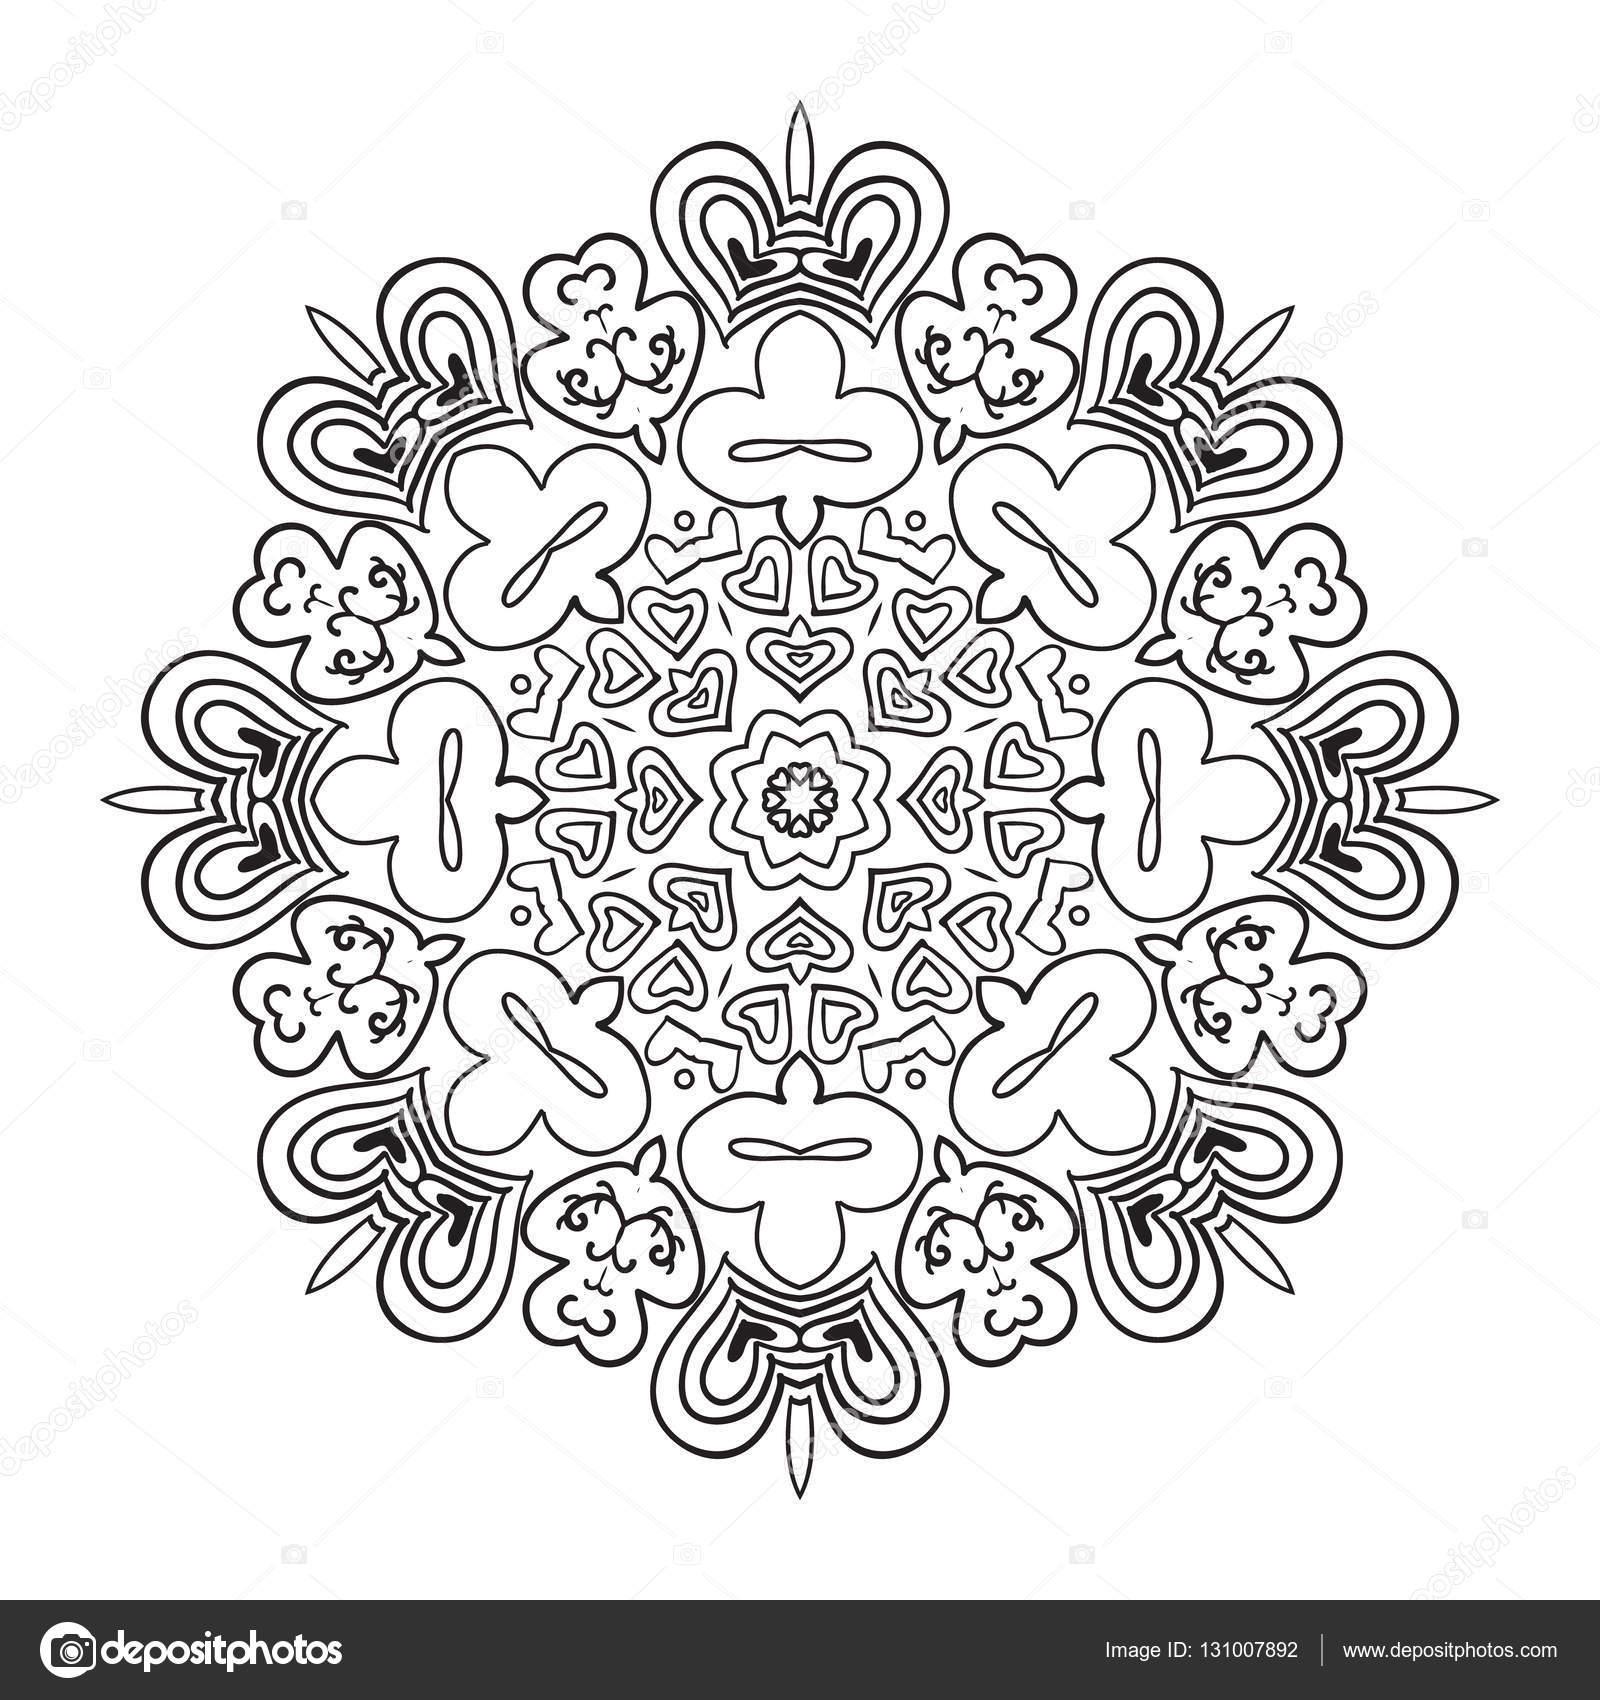 Malbuch. Mandala östlichen Muster. Zentangl Runde ornament ...